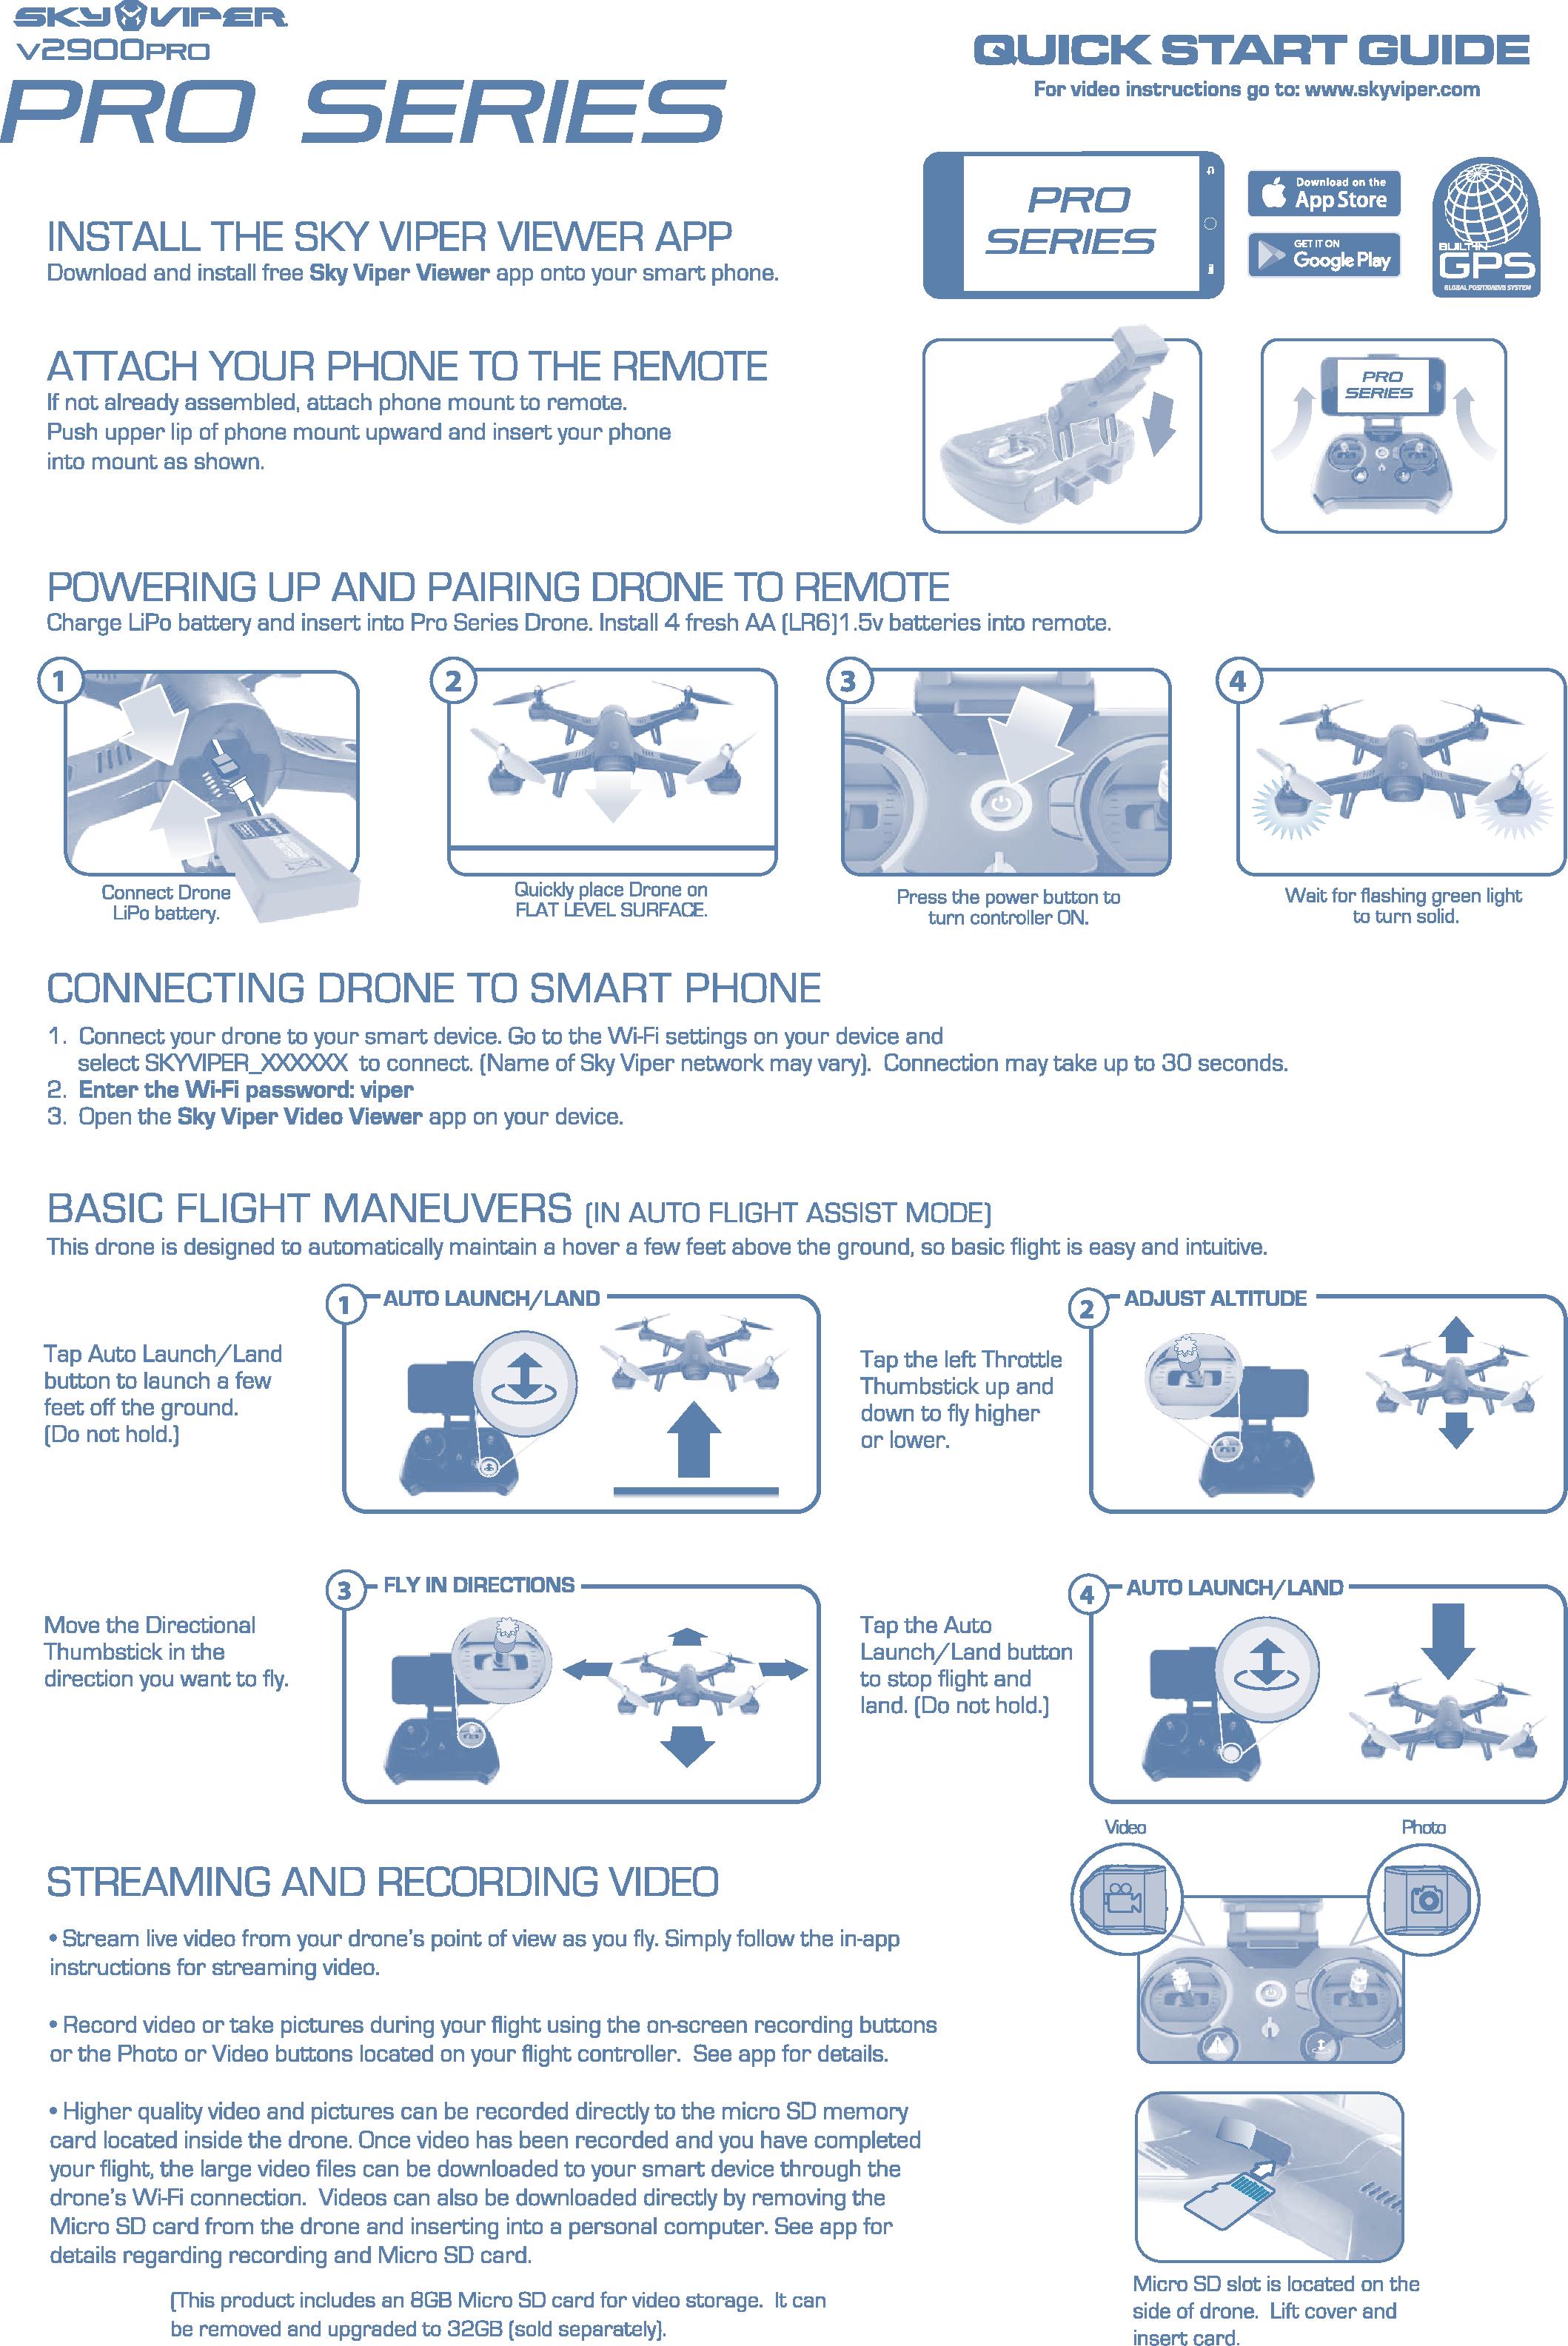 skyrocket toys 01602rx24g sky viper pro series video drone drone rh usermanual wiki Online User Guide Kindle Fire User Guide